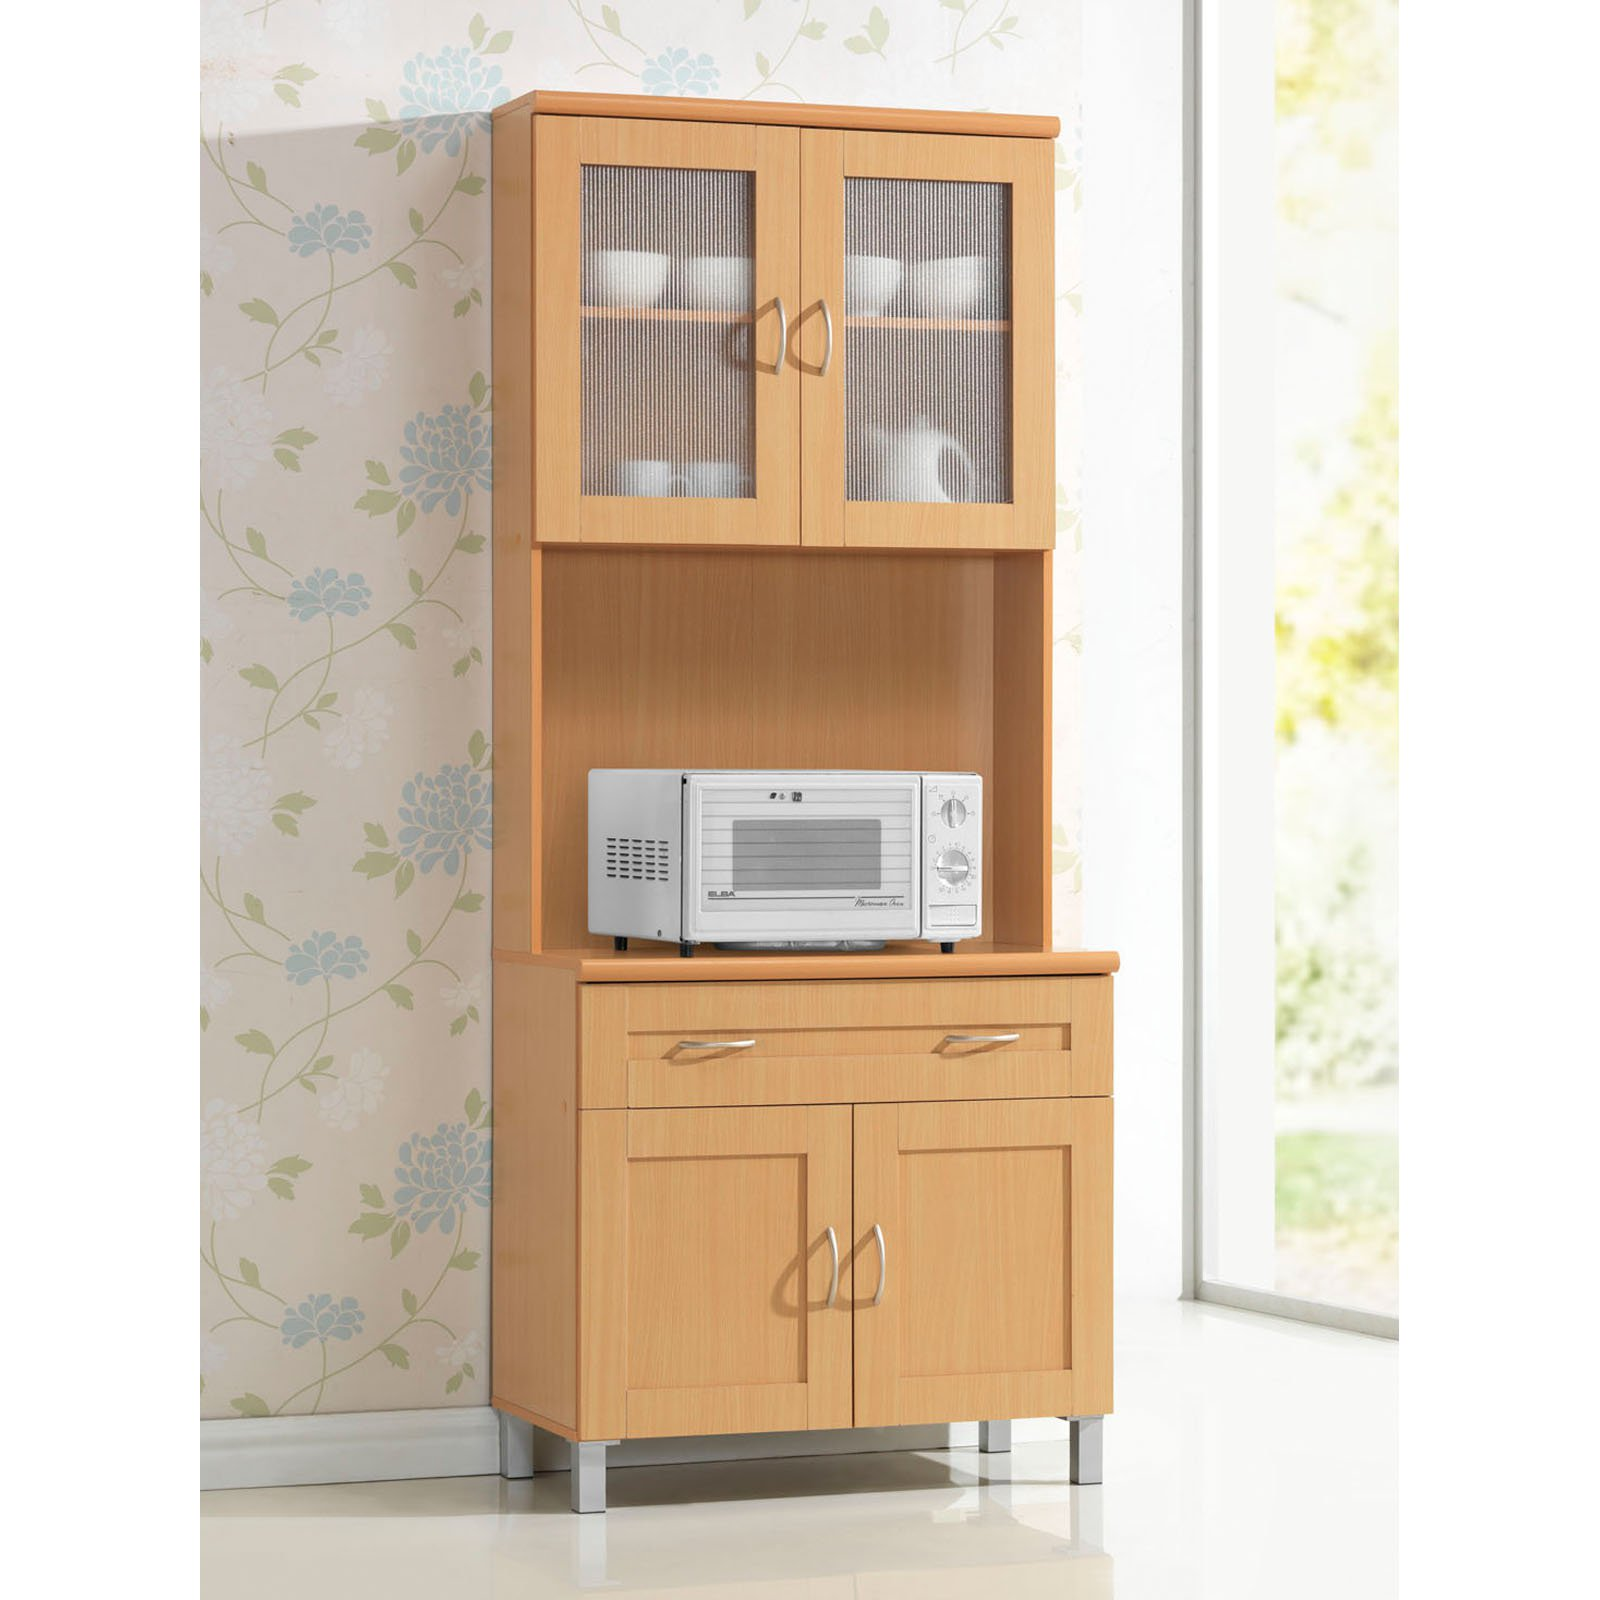 Kitchen Shelves Walmart: Hodedah HIK92 Kitchen Cabinet